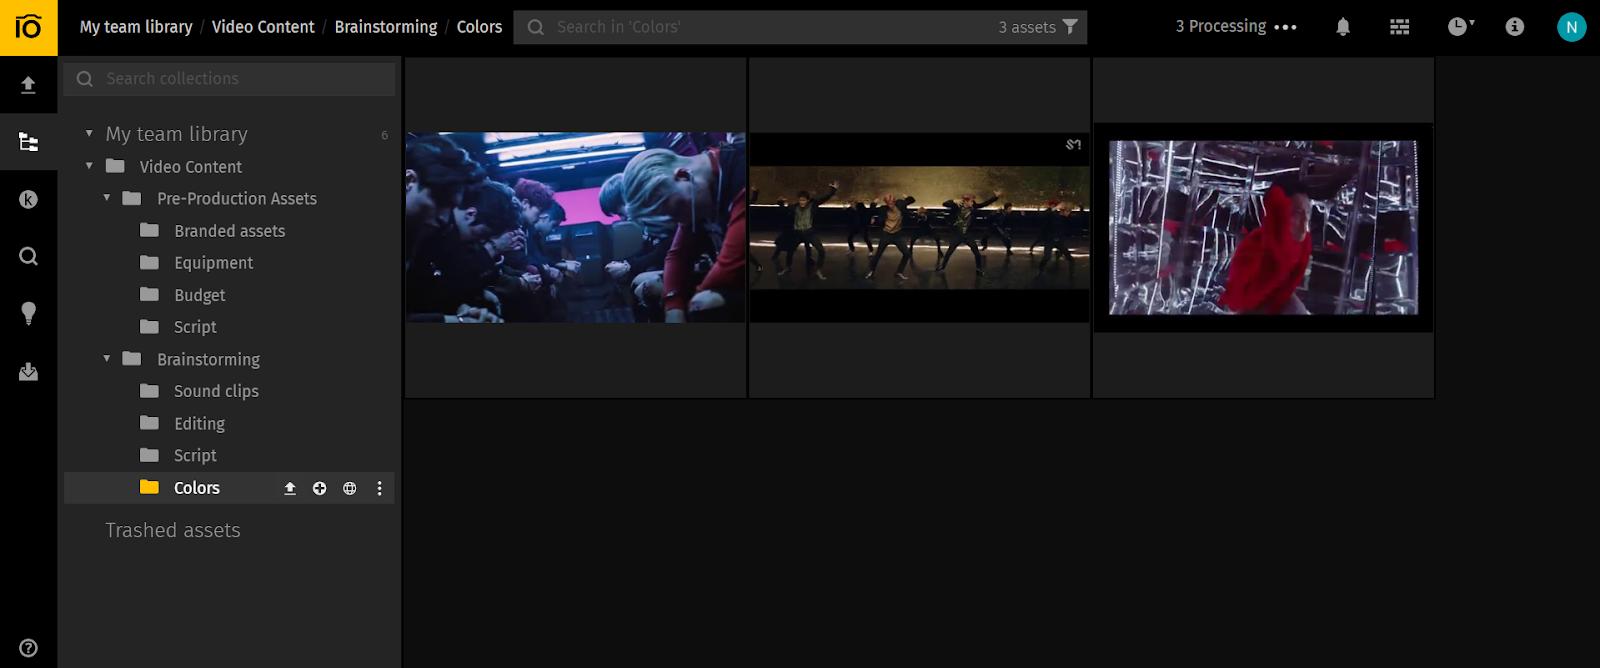 Pics.io video library